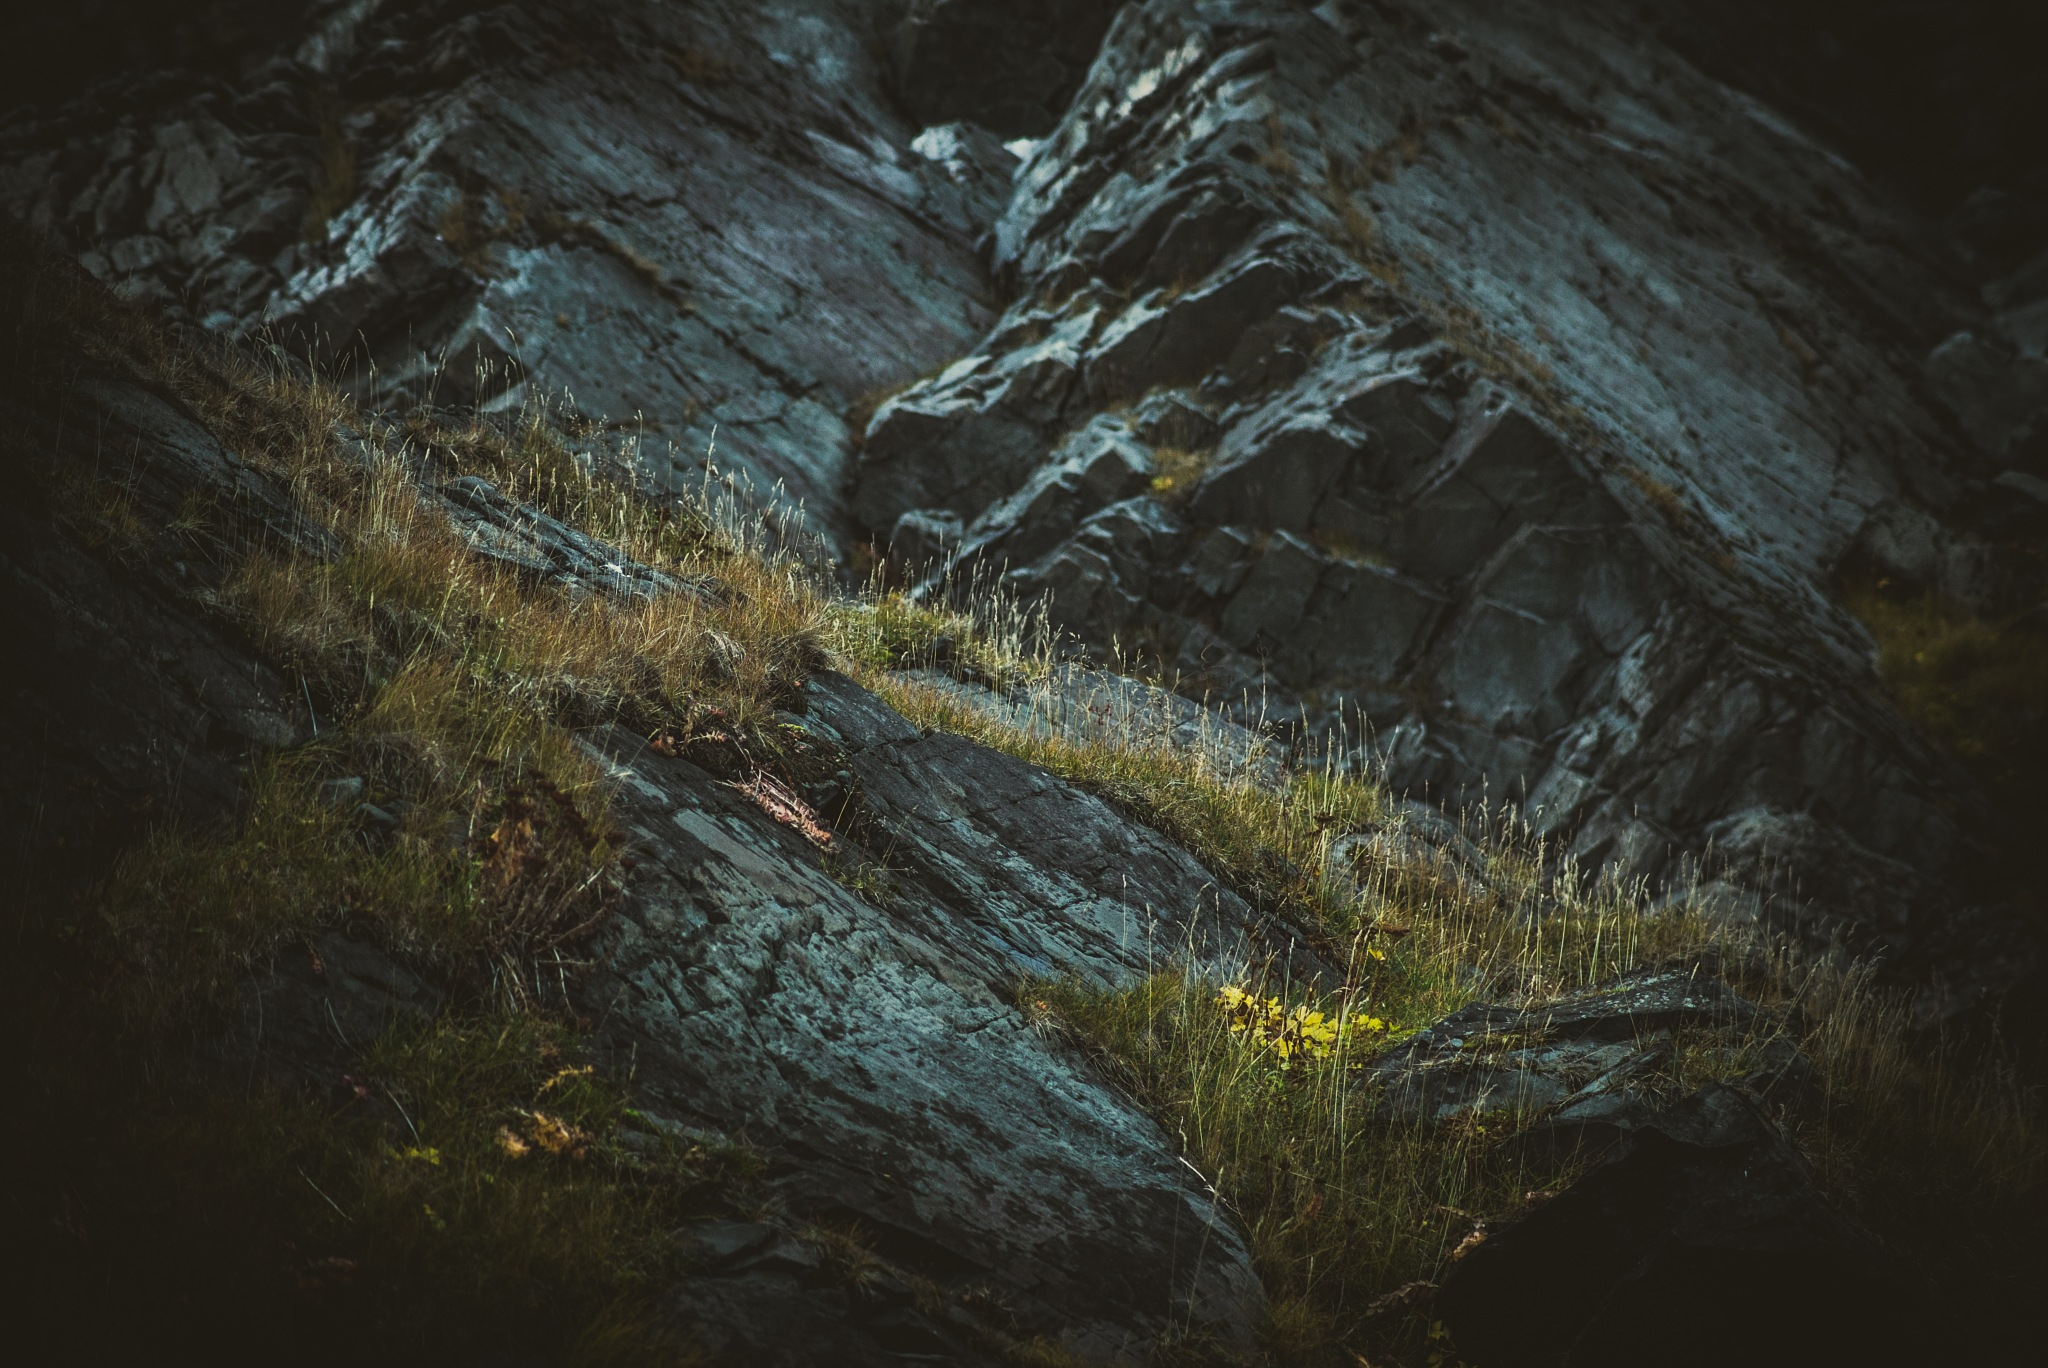 Light's Play by Juuso Voutilainen